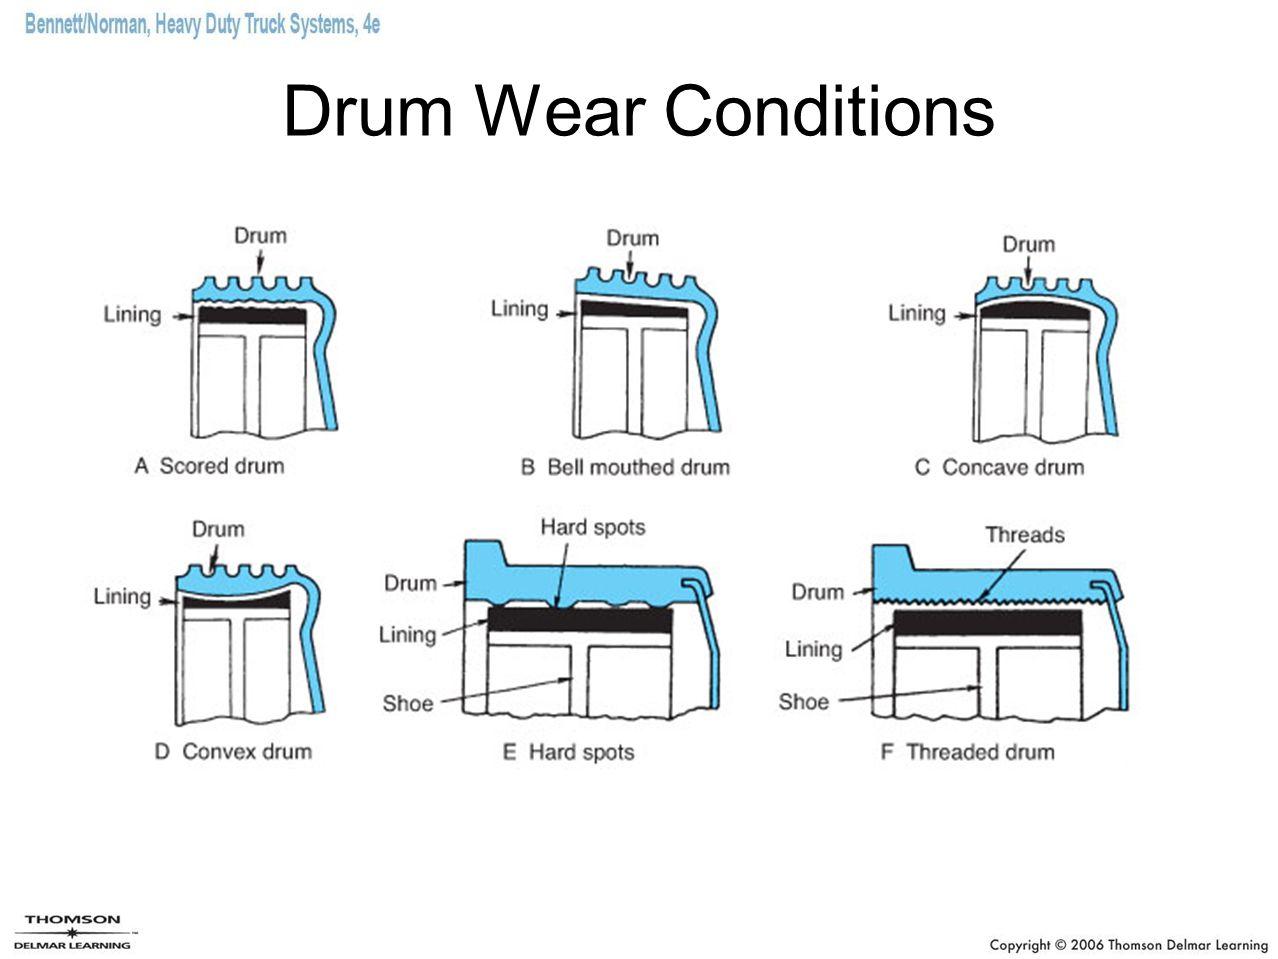 Drum Wear Conditions